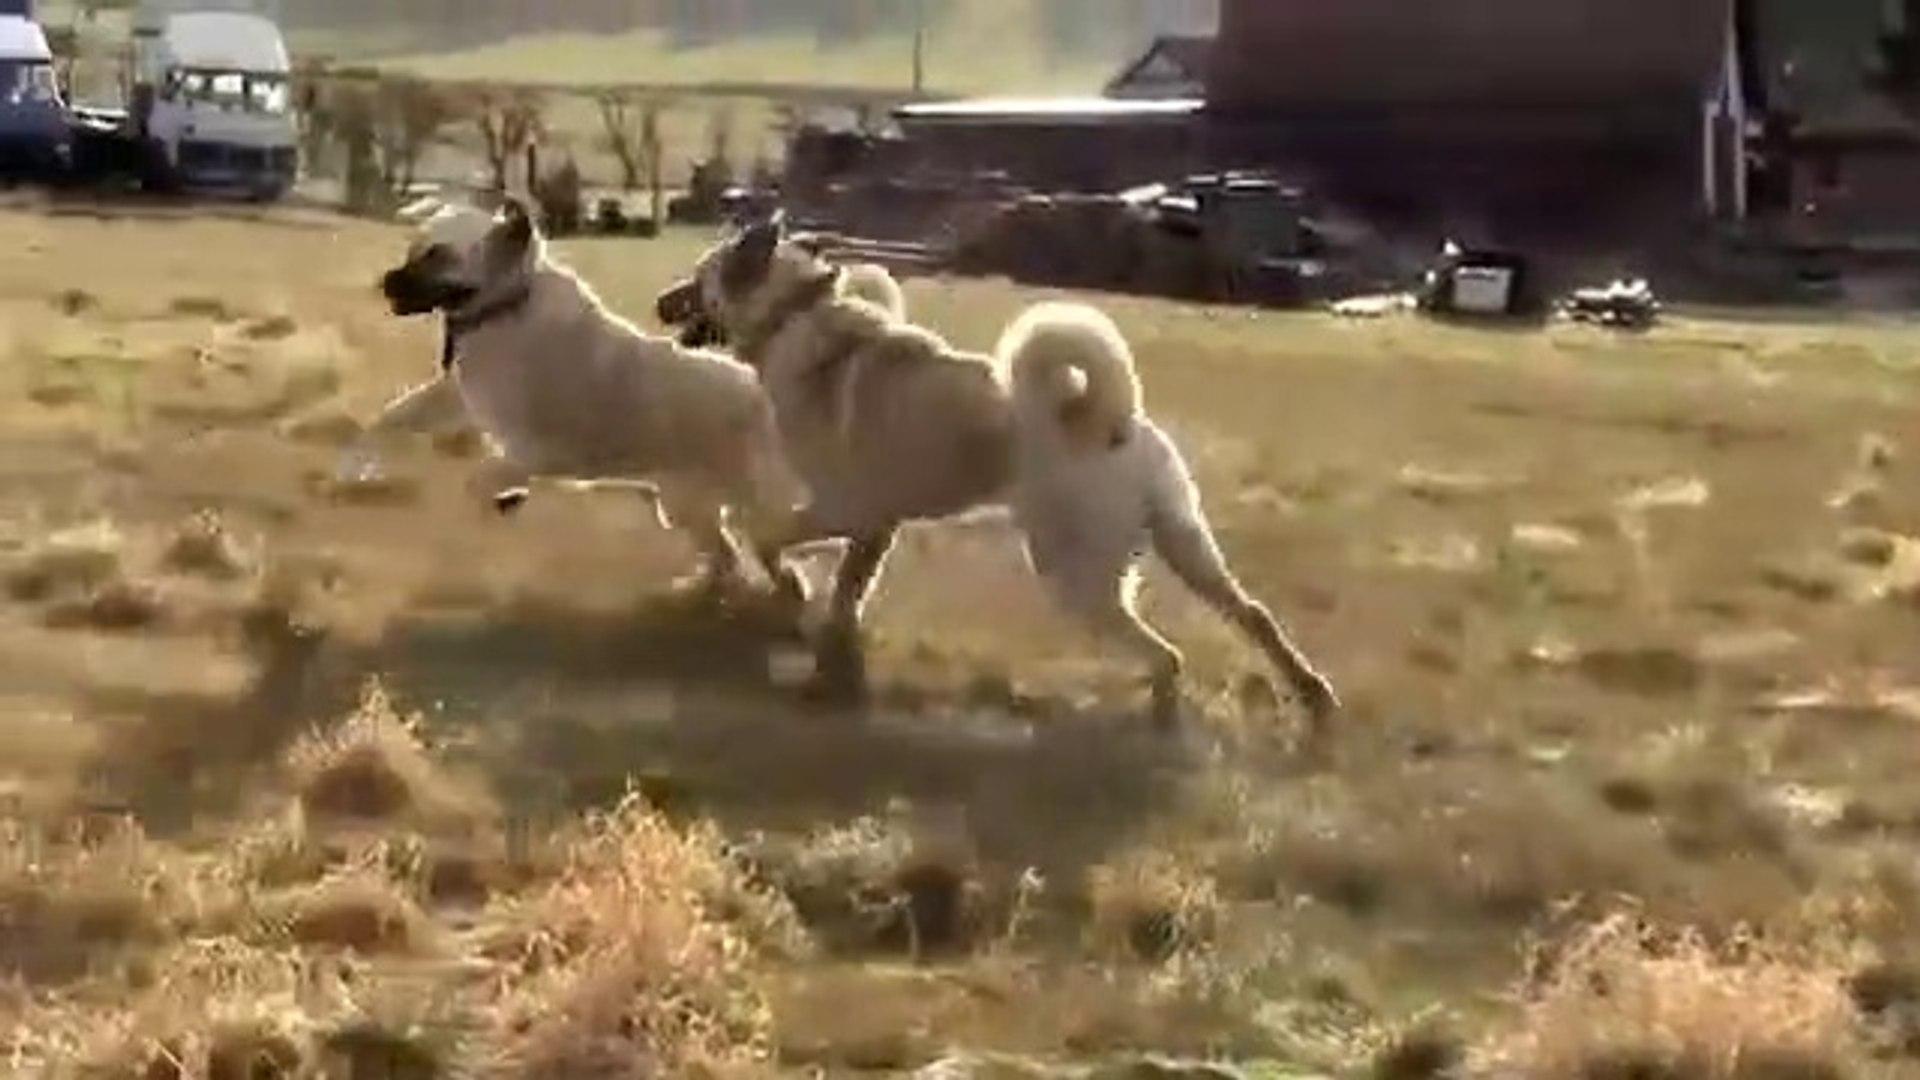 KANGAL KOPEKLERi ve KUCUK ARKADASLARI - KANGAL SHEPHERD DOG and LiTTLE FRiENDS